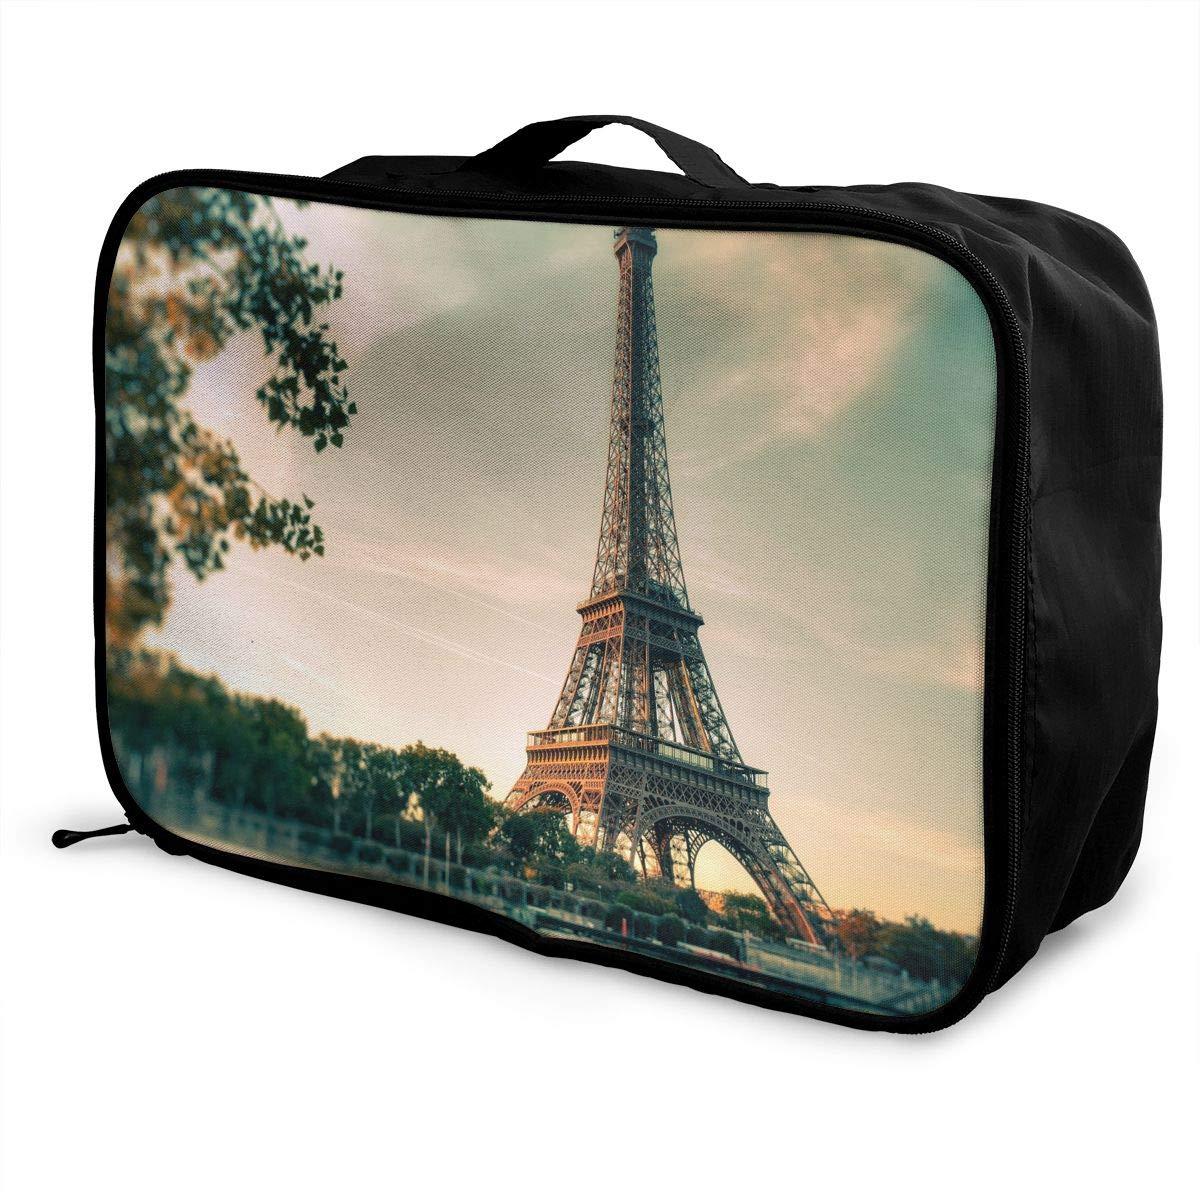 Travel Luggage Duffle Bag Lightweight Portable Handbag Eiffel Tower Painting Large Capacity Waterproof Foldable Storage Tote